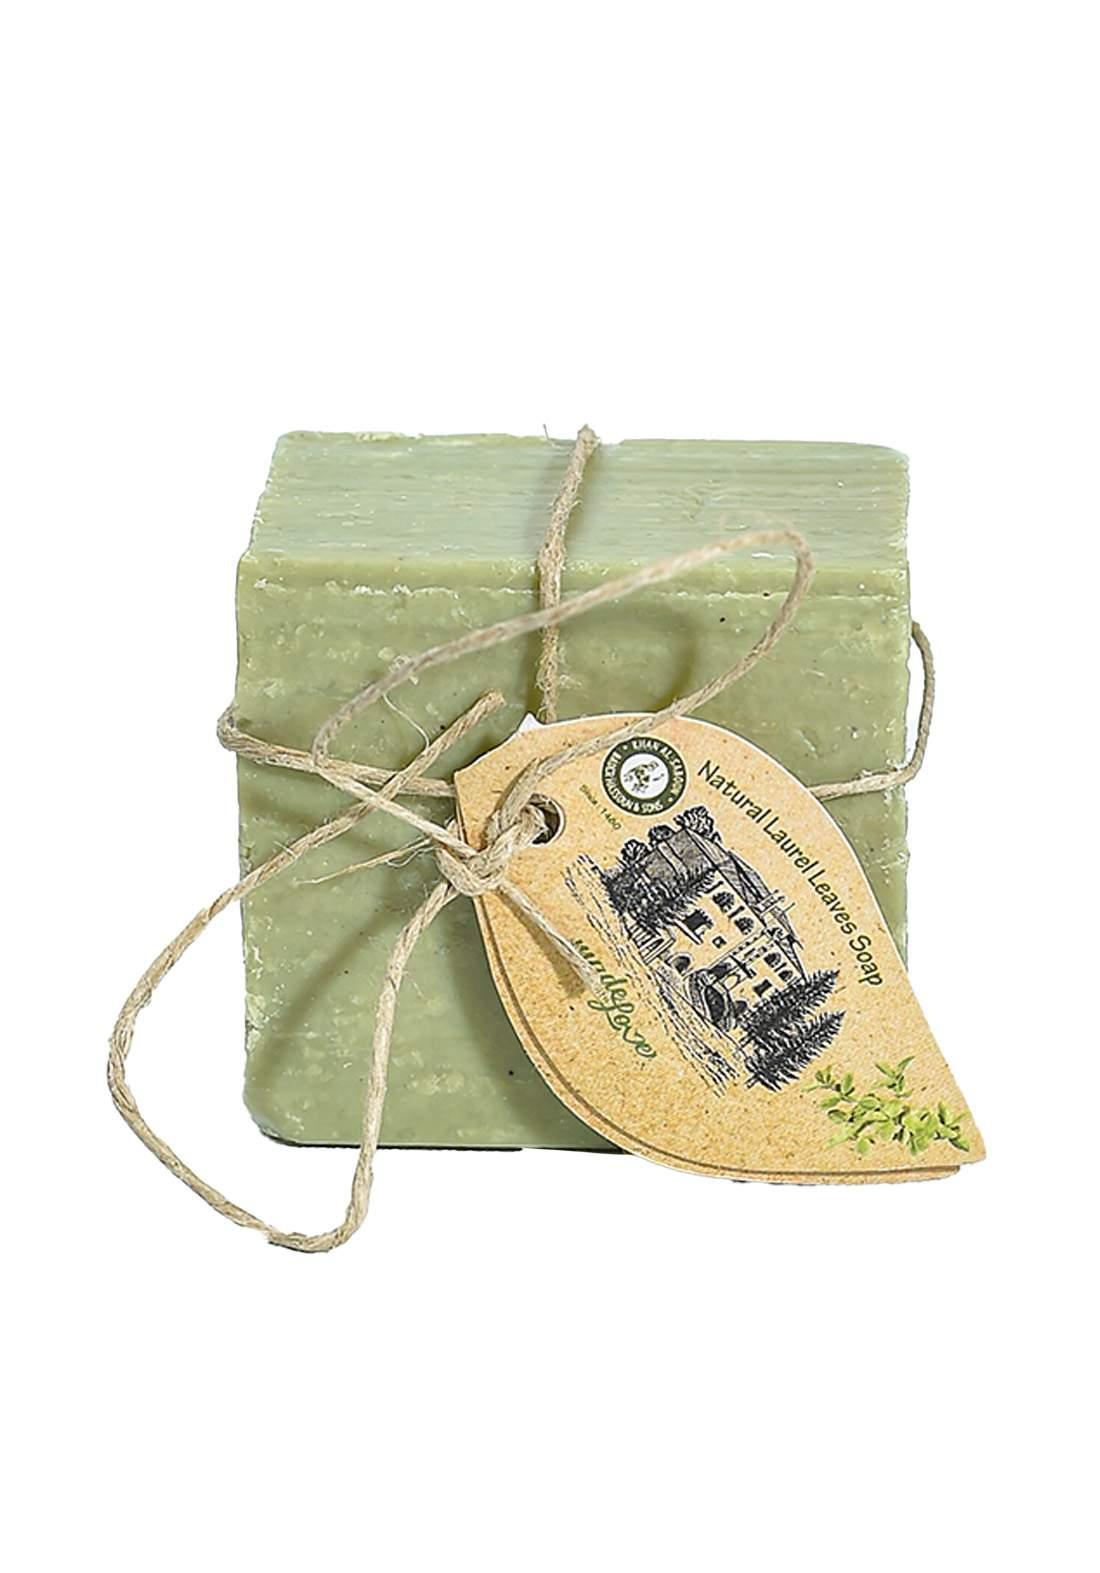 Khan Alsaboun Natural Laurel Leaves Soap 140 g صابون غار